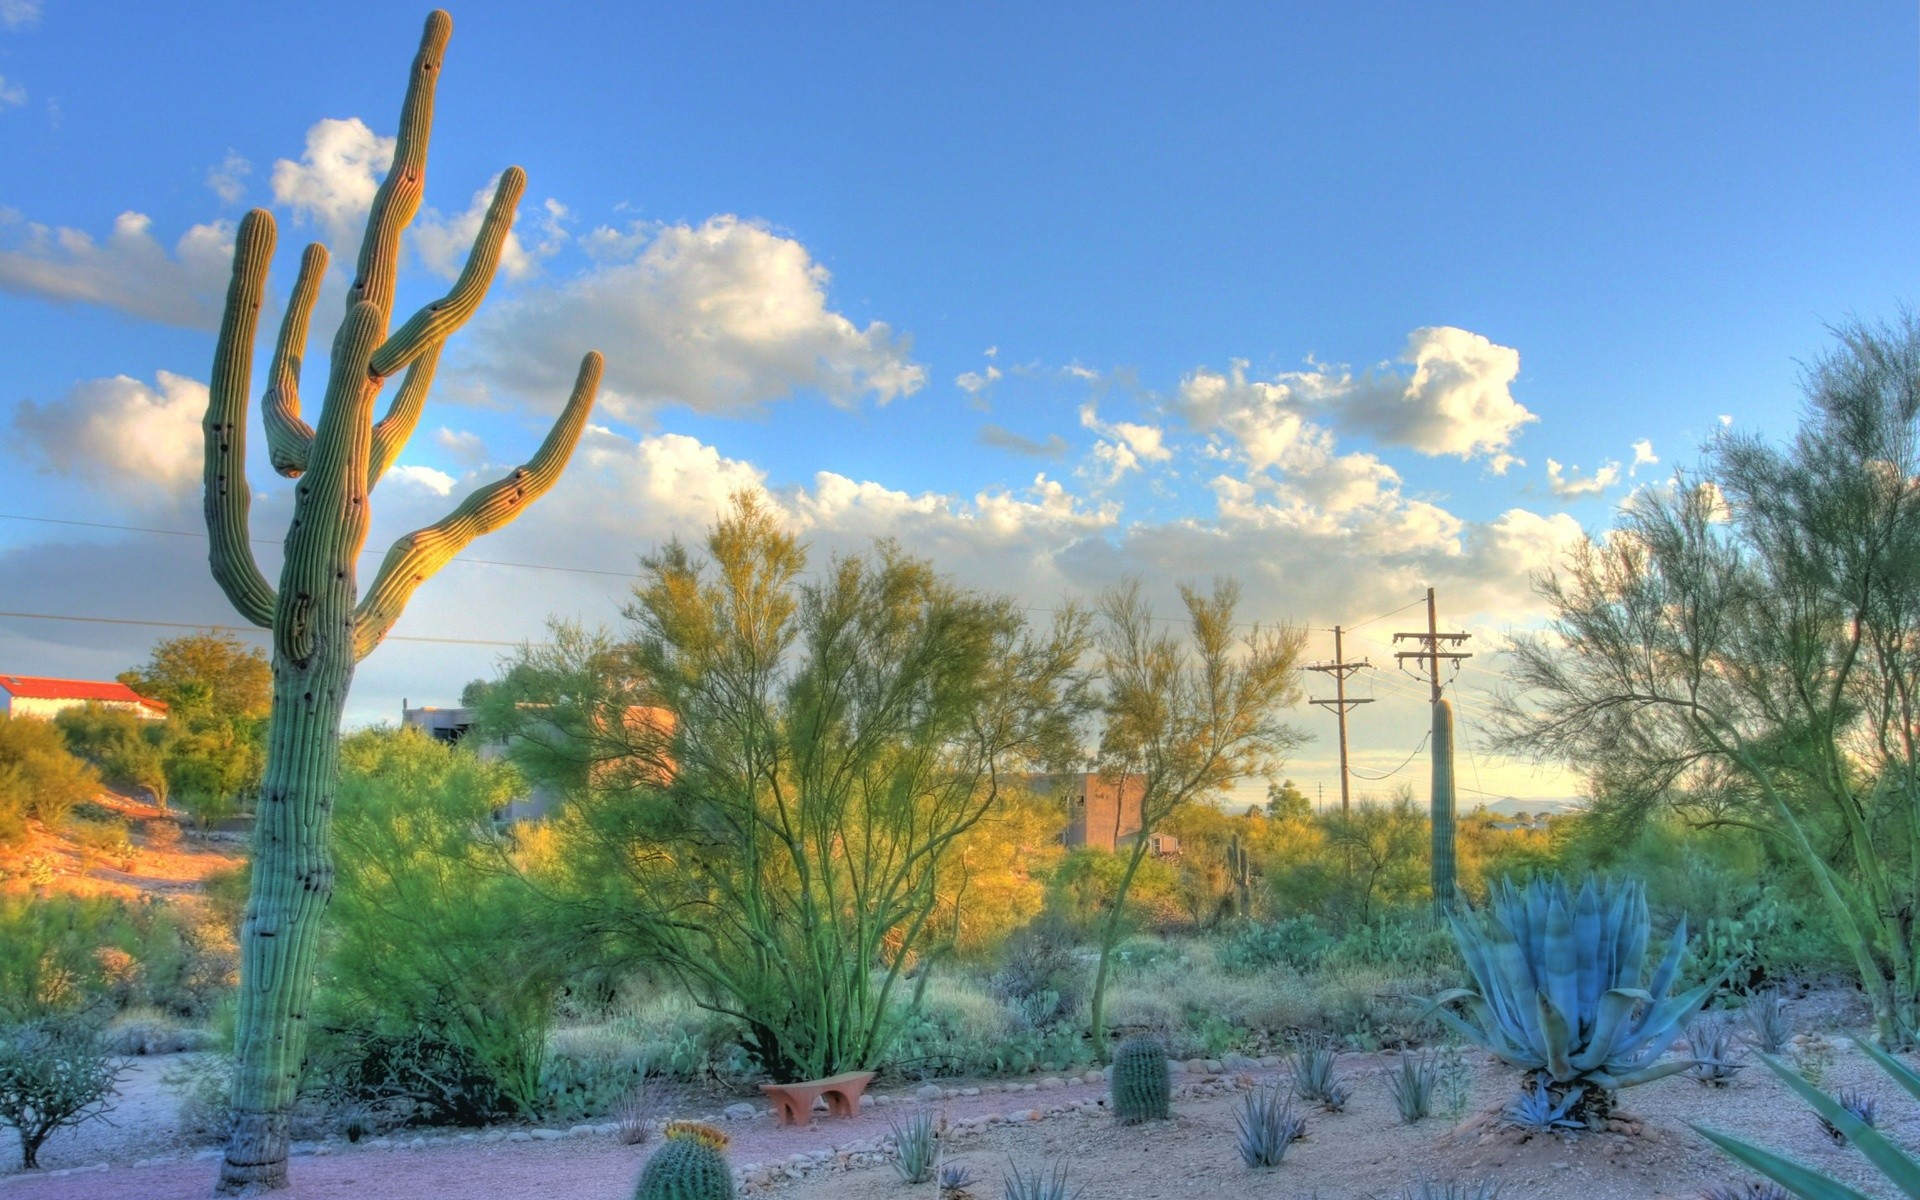 Desert Arizona Wallpaper 1920x1200 Desert Arizona Cactus Tucson 1920x1200